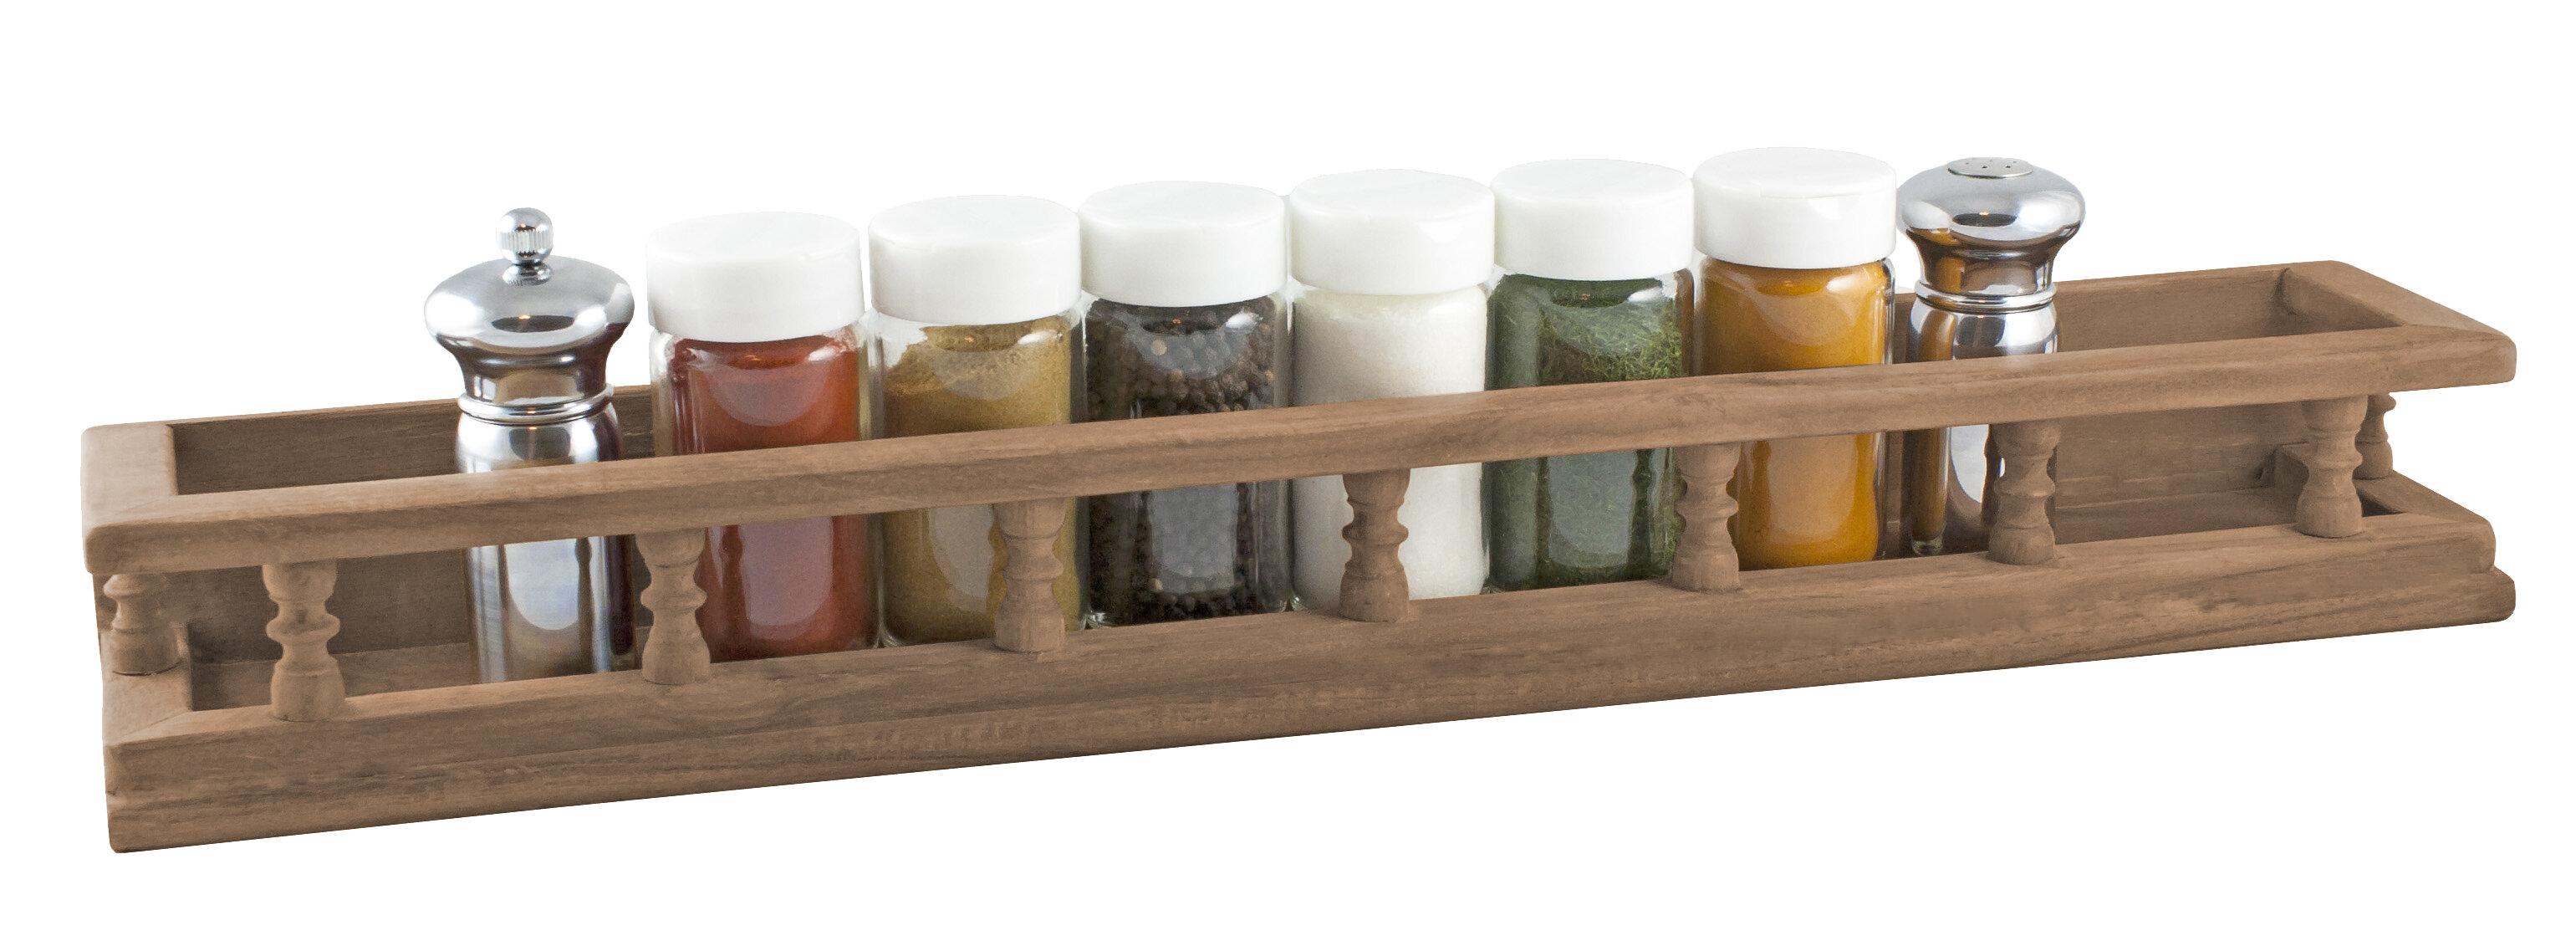 White 4pcs 20-Clips Kitchen Spice Jar Rack Seasoning Jar Storage Holder Cupboard Door Cabinet Wall Mounted Gizayen Spice Racks Wall Mounted